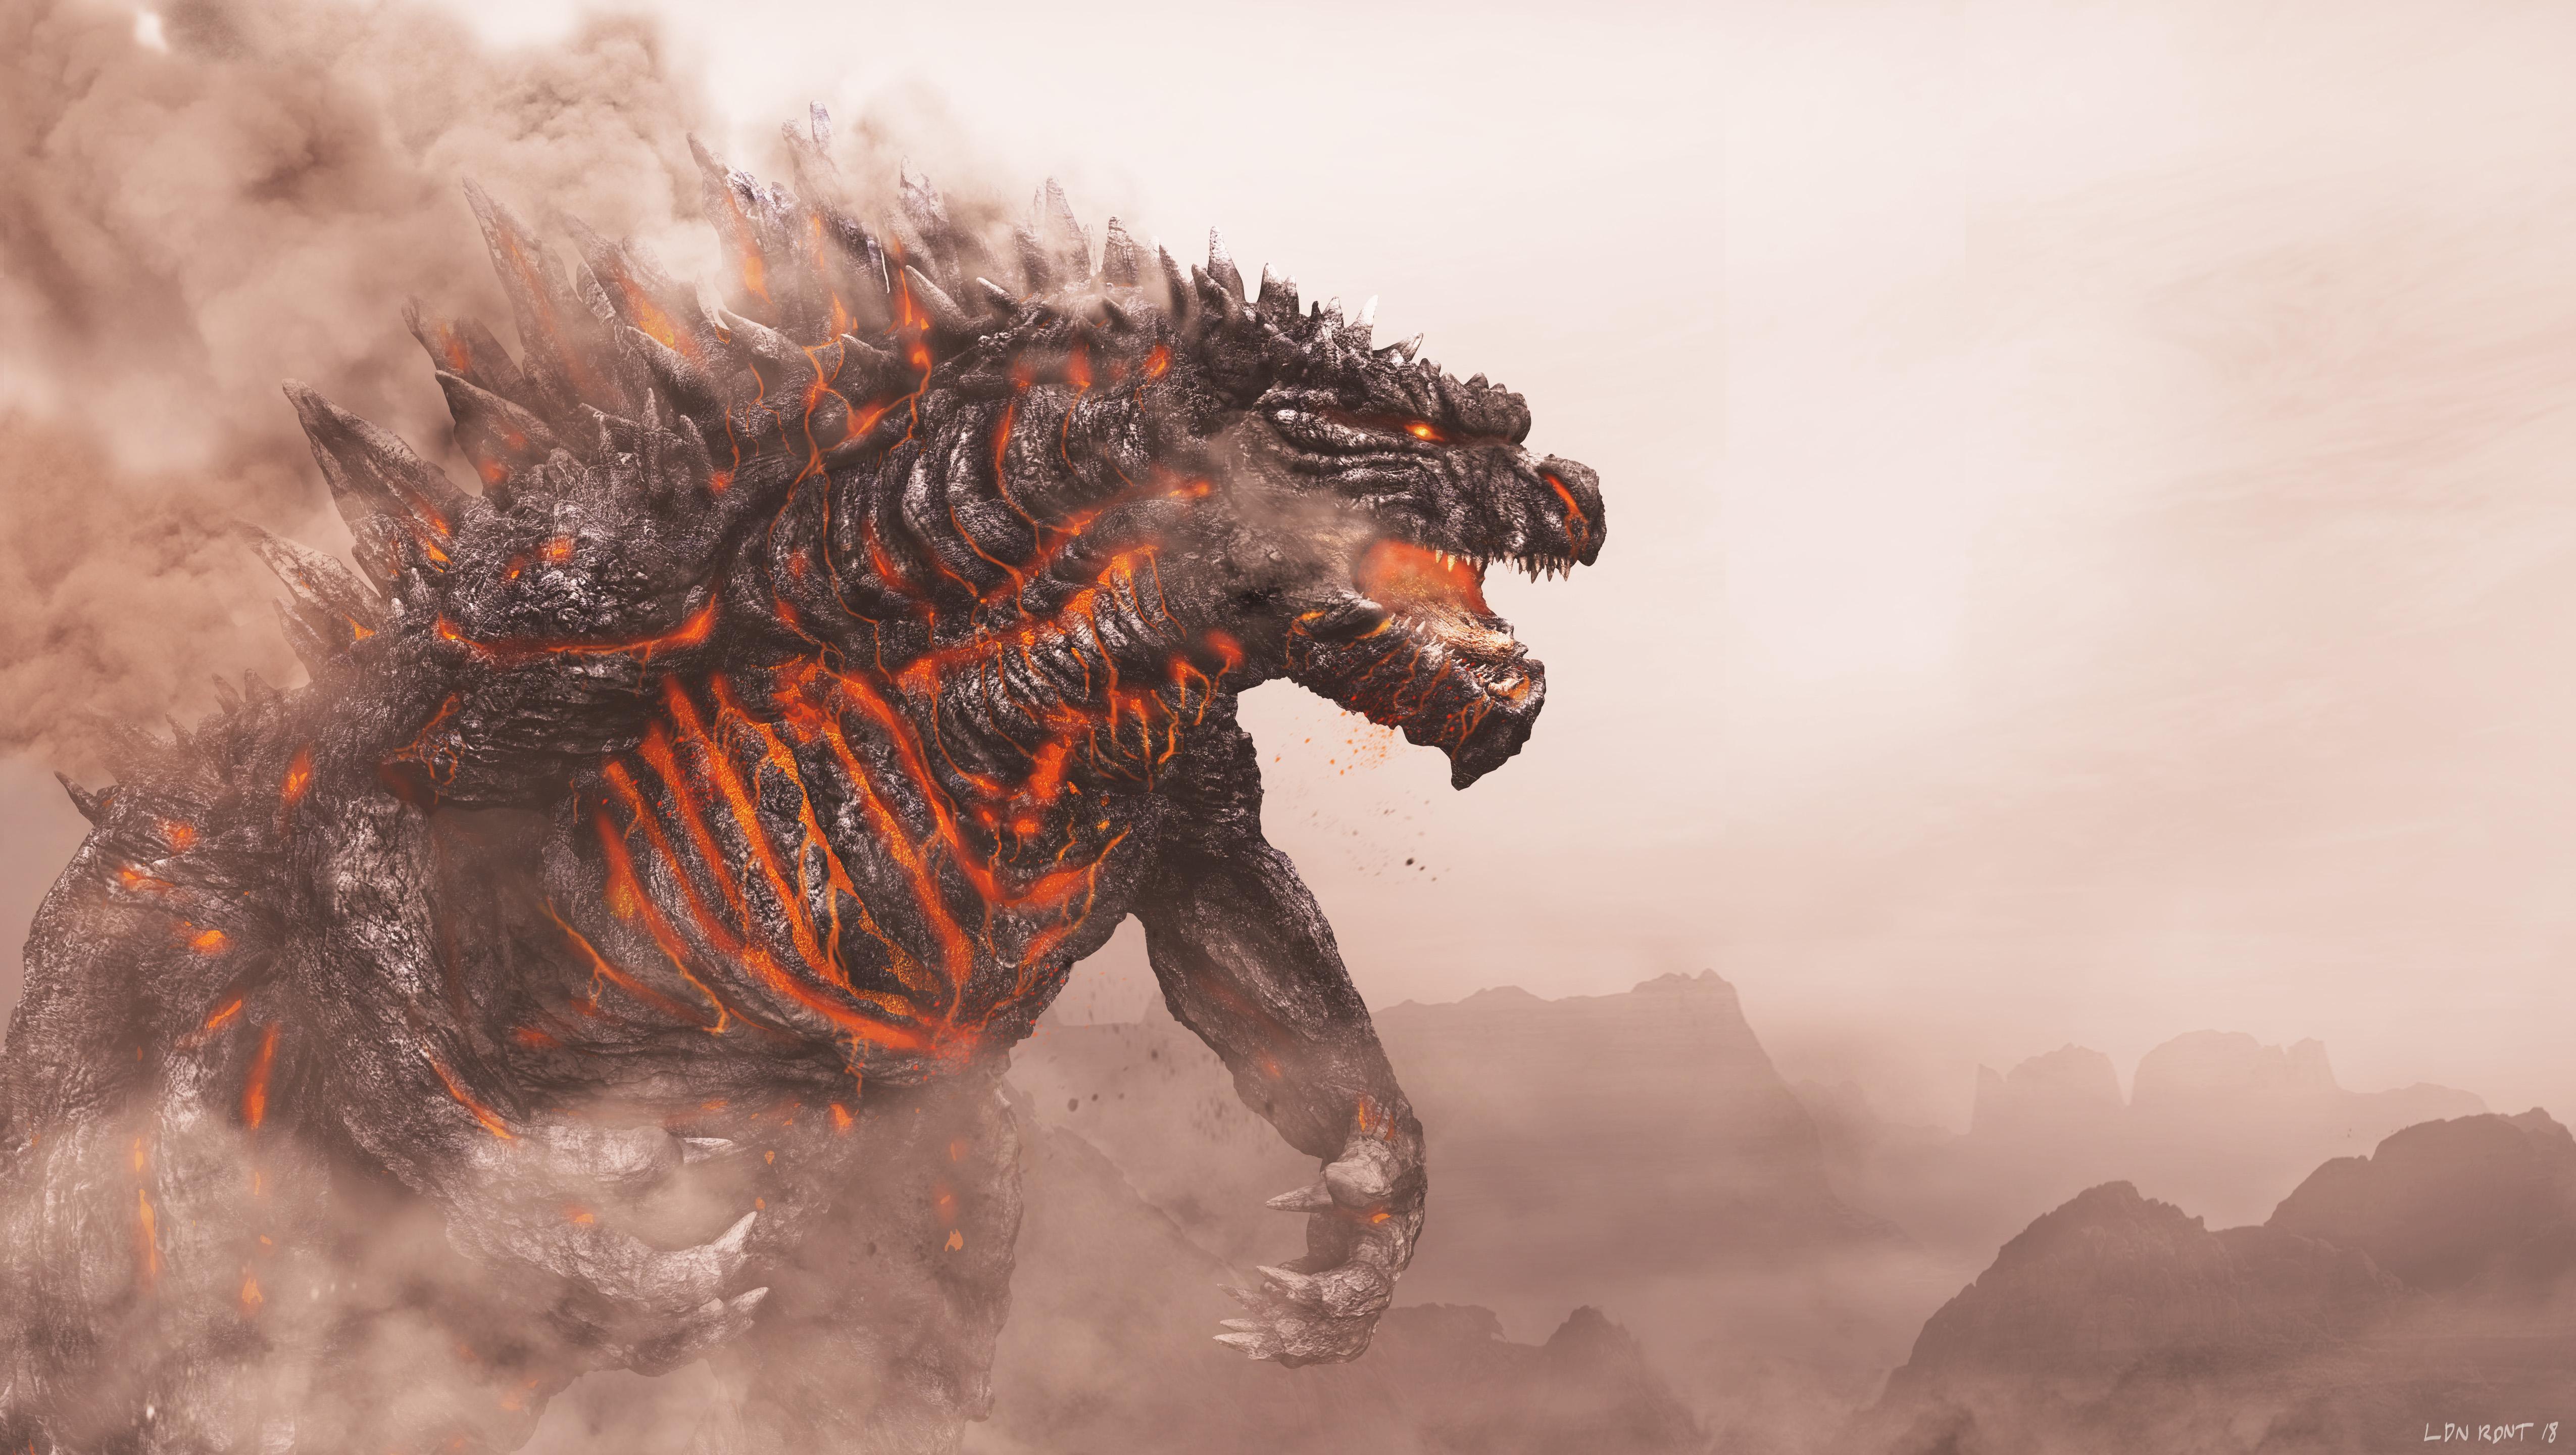 Godzilla 4k Ultra Hd Wallpaper Background Image 5100x2880 Id